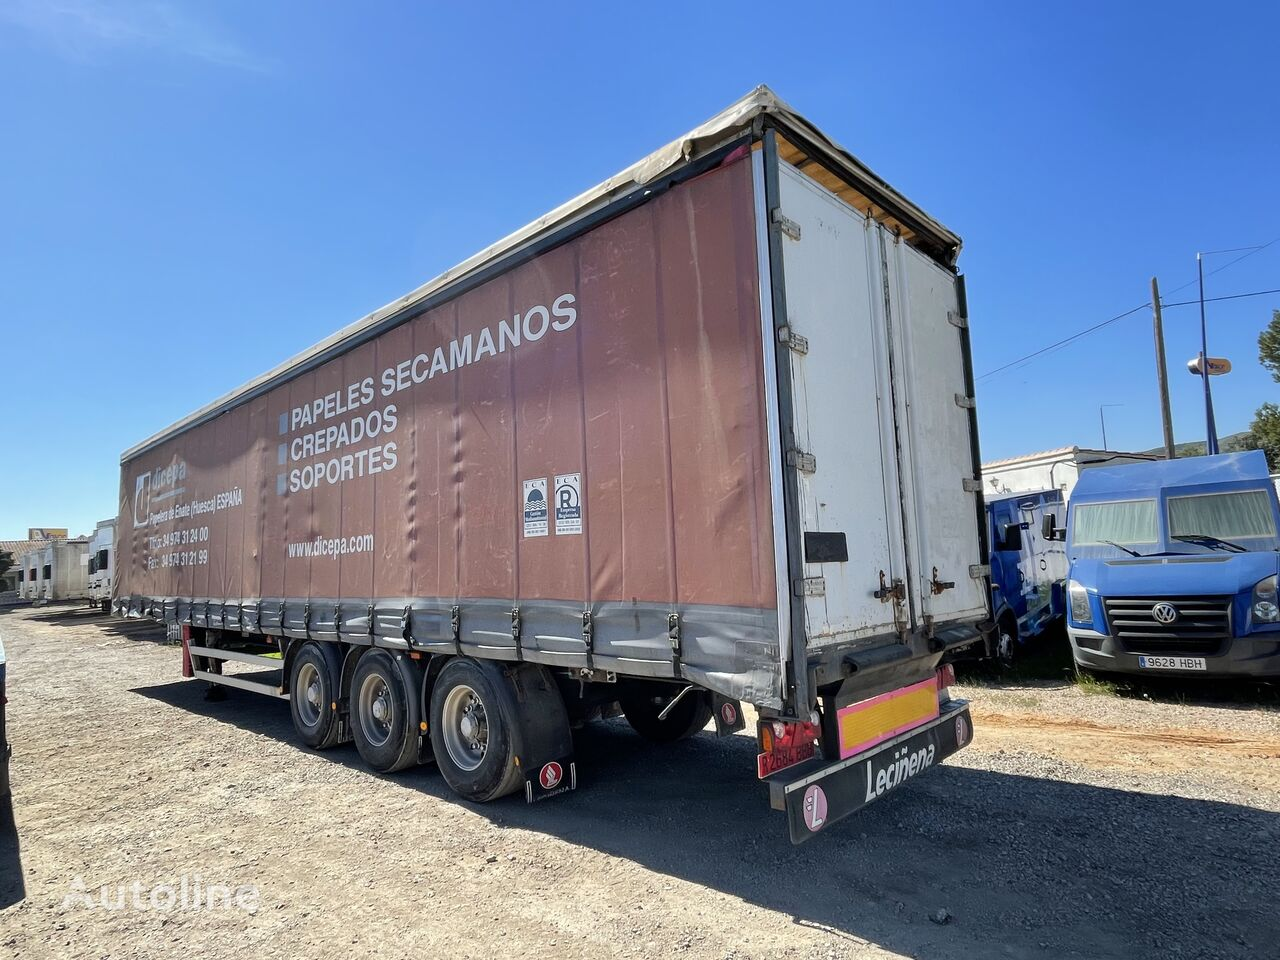 LECINENA Tauliner  curtain side semi-trailer